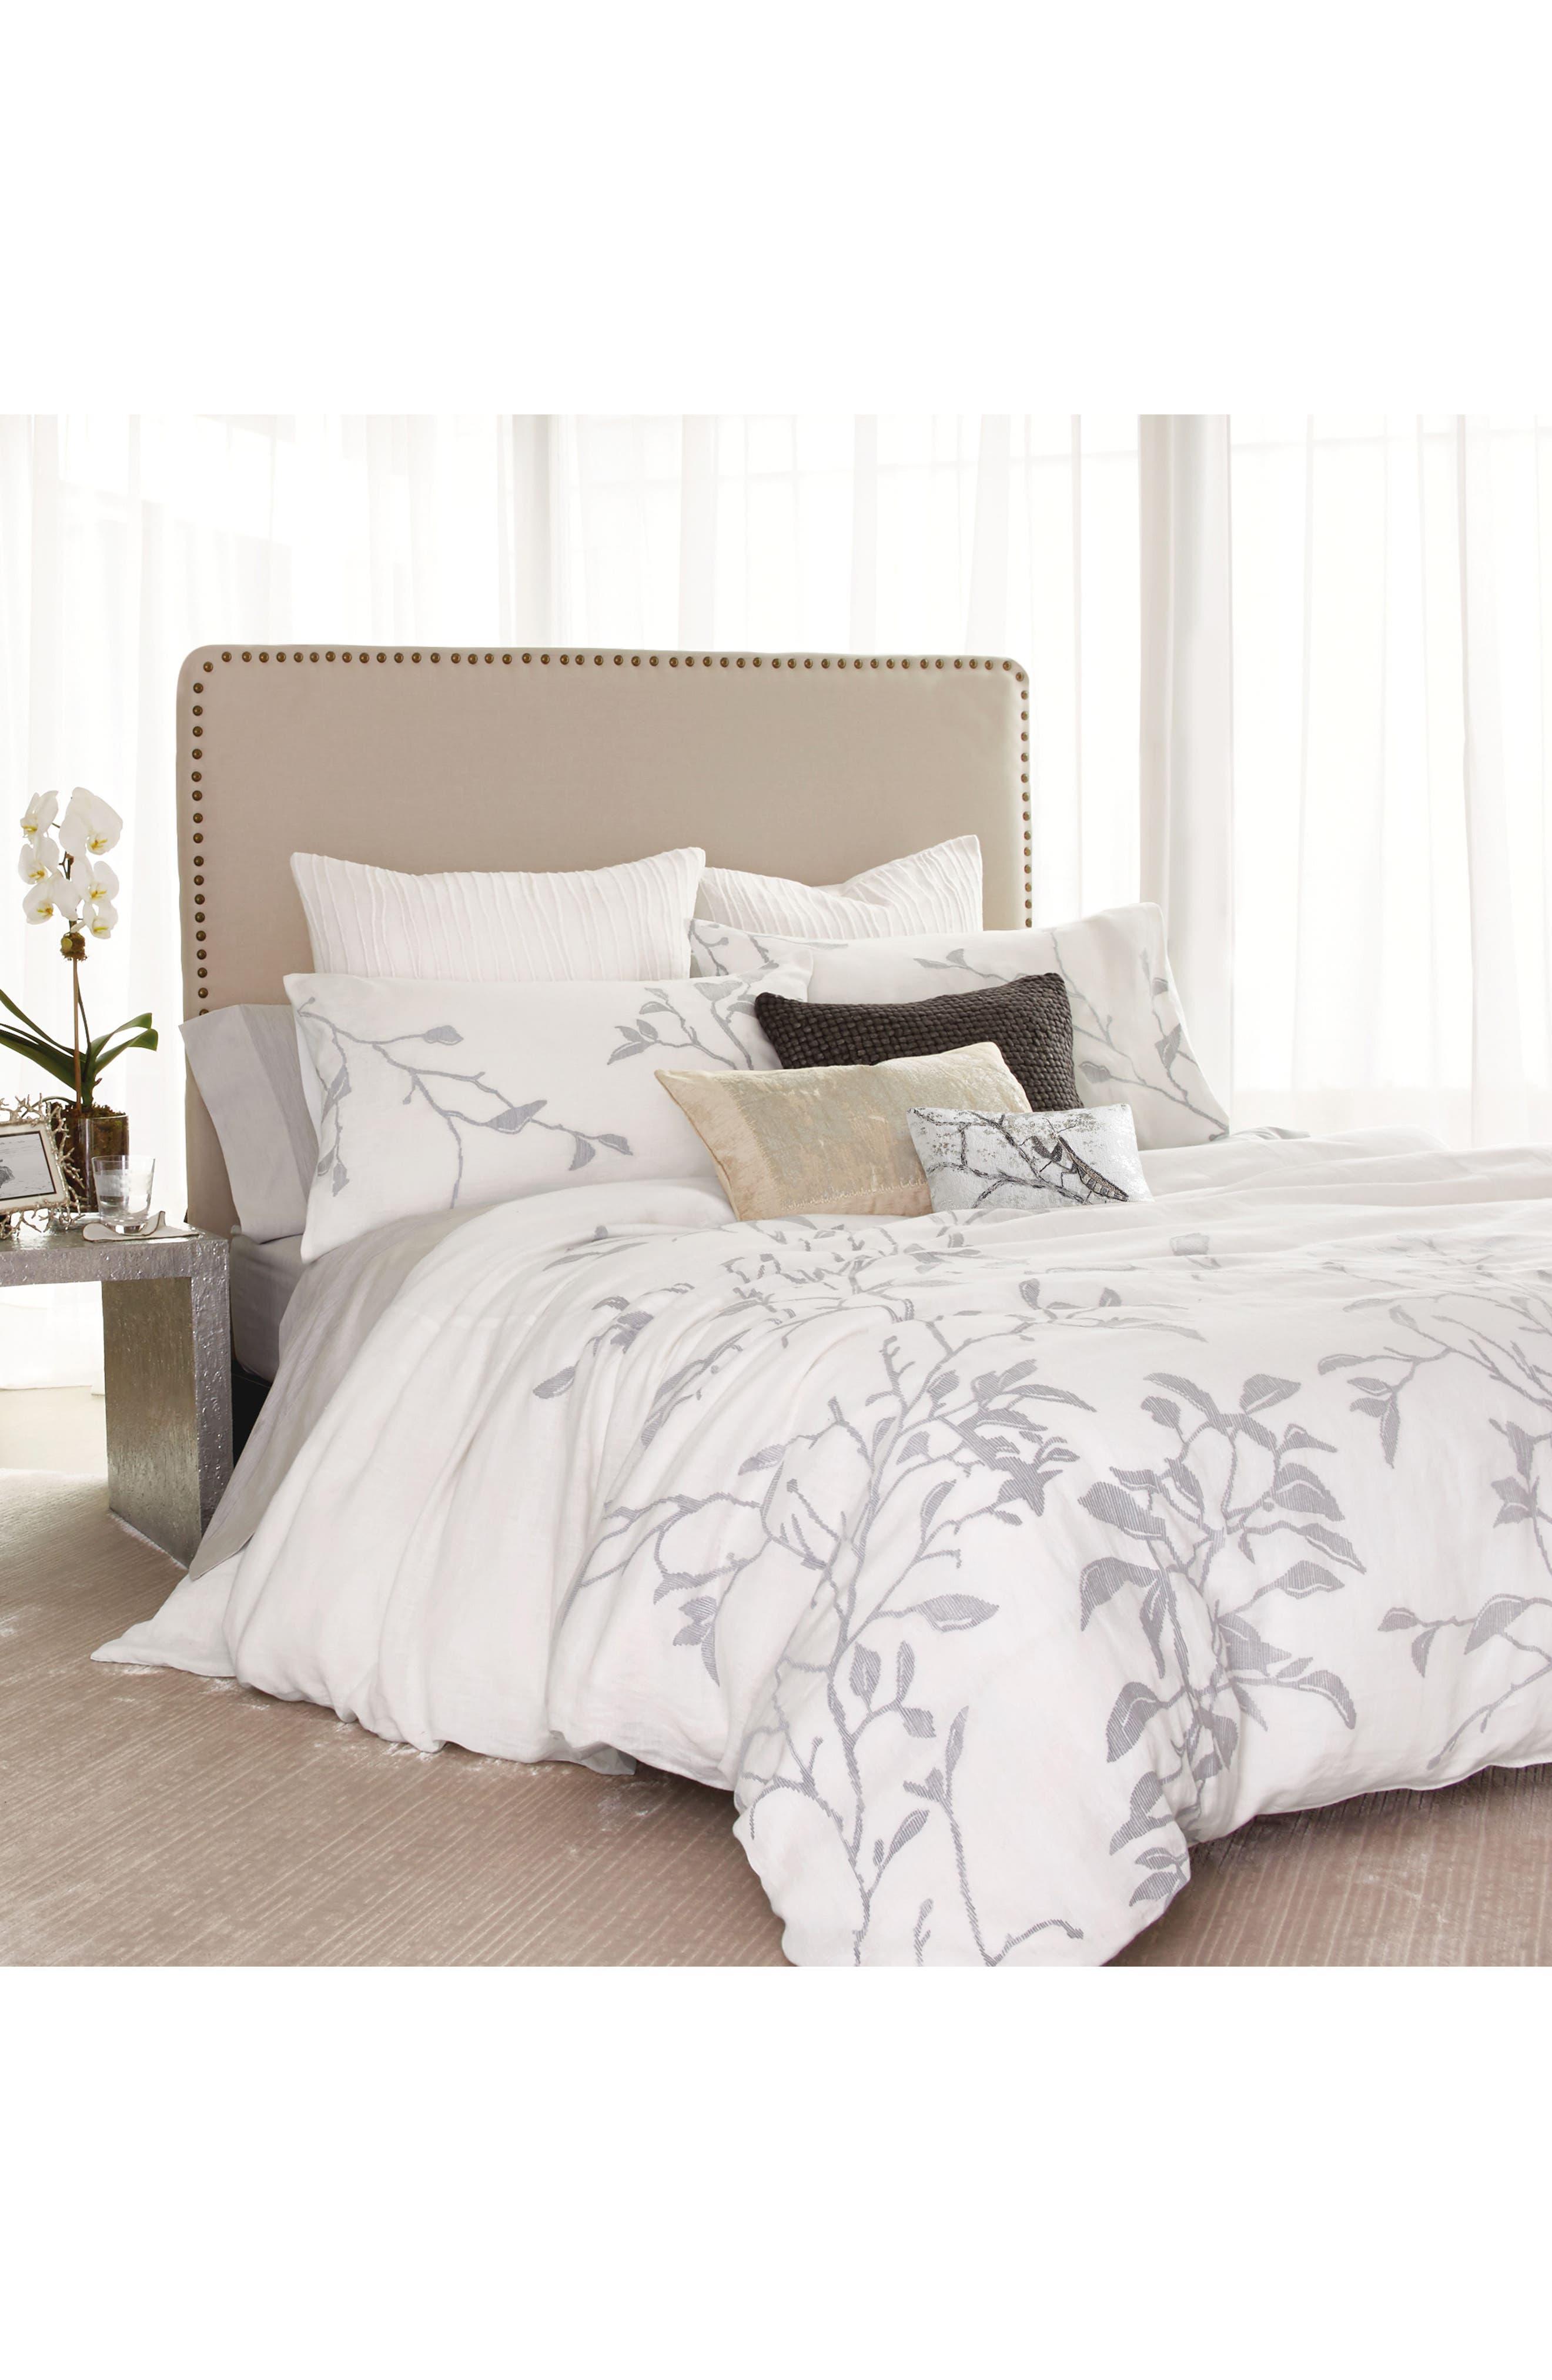 Branch Duvet Cover,                         Main,                         color, White